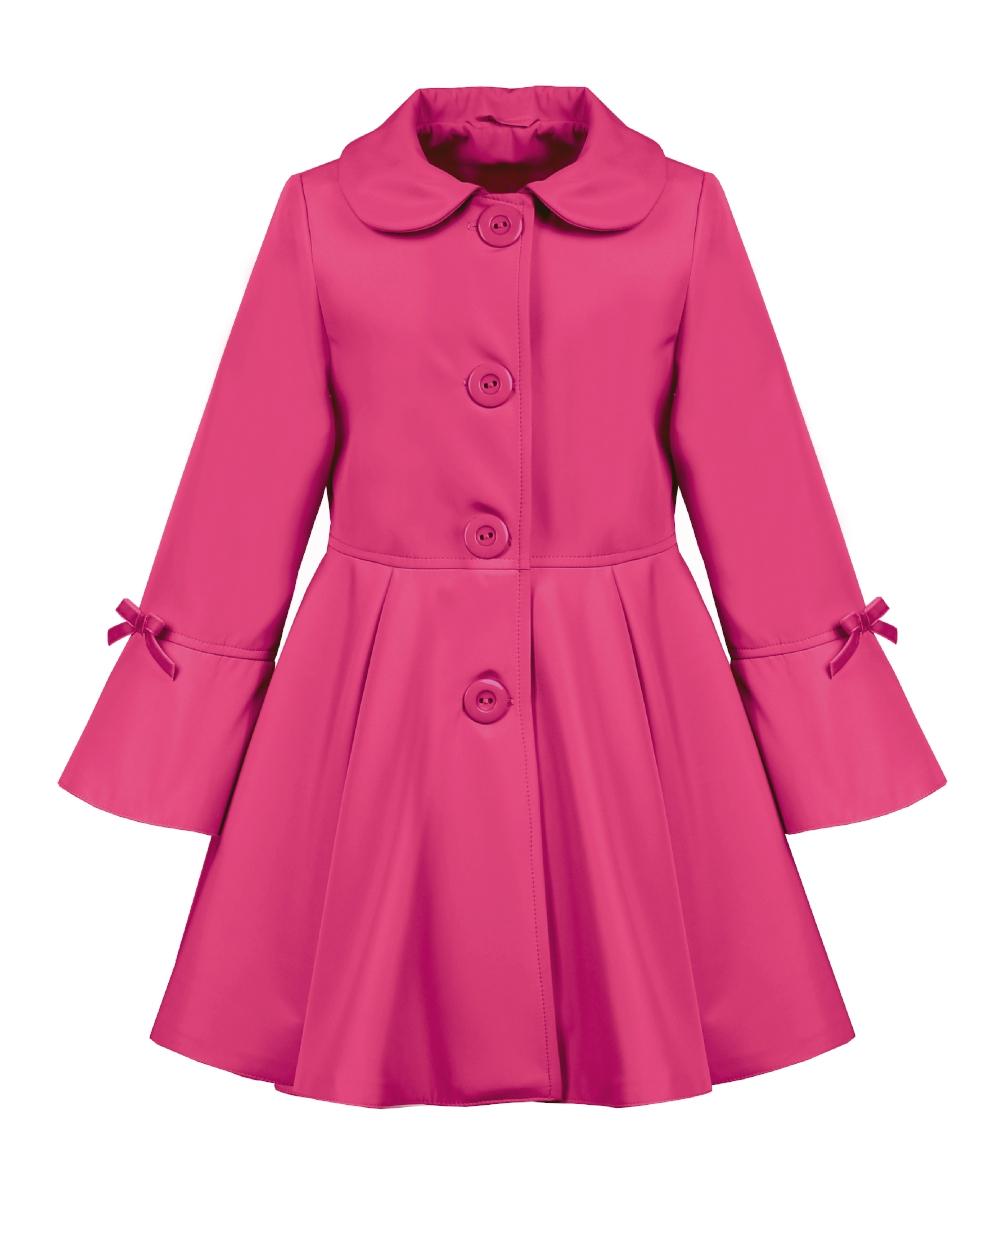 643c3c4d4e66 detský jarný kabátik ELLEN ružový